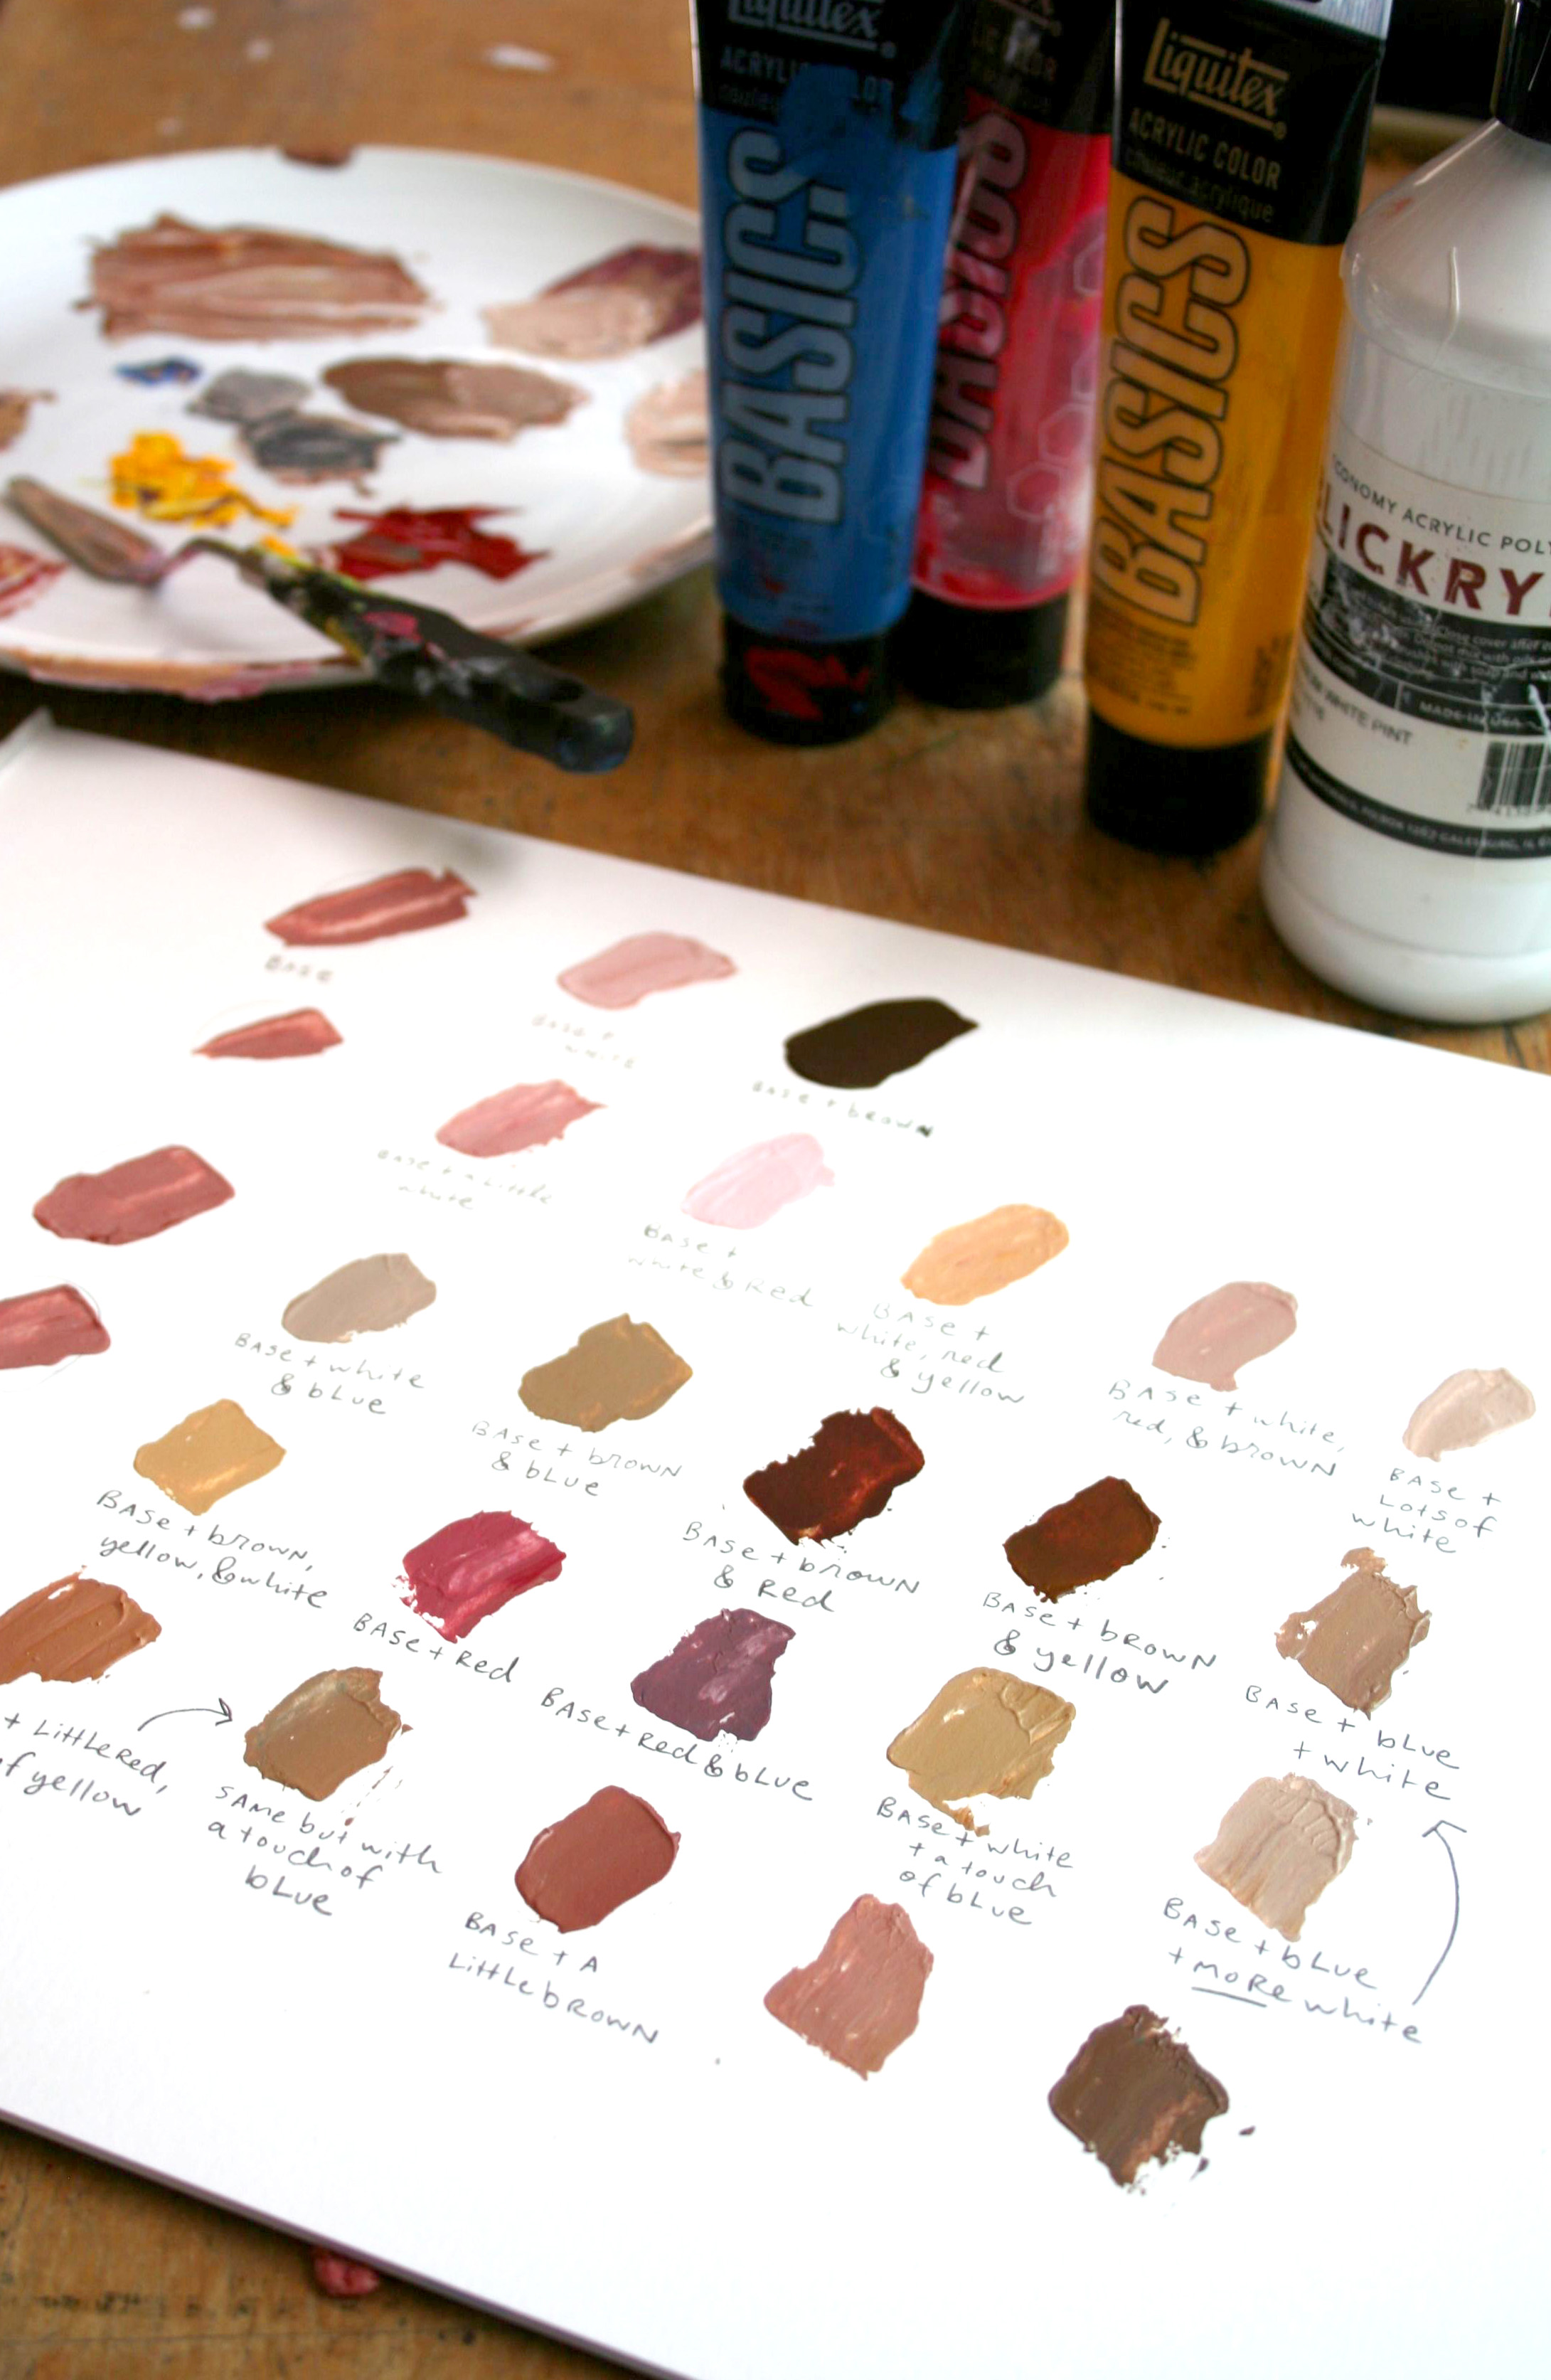 Acrylic skin tones